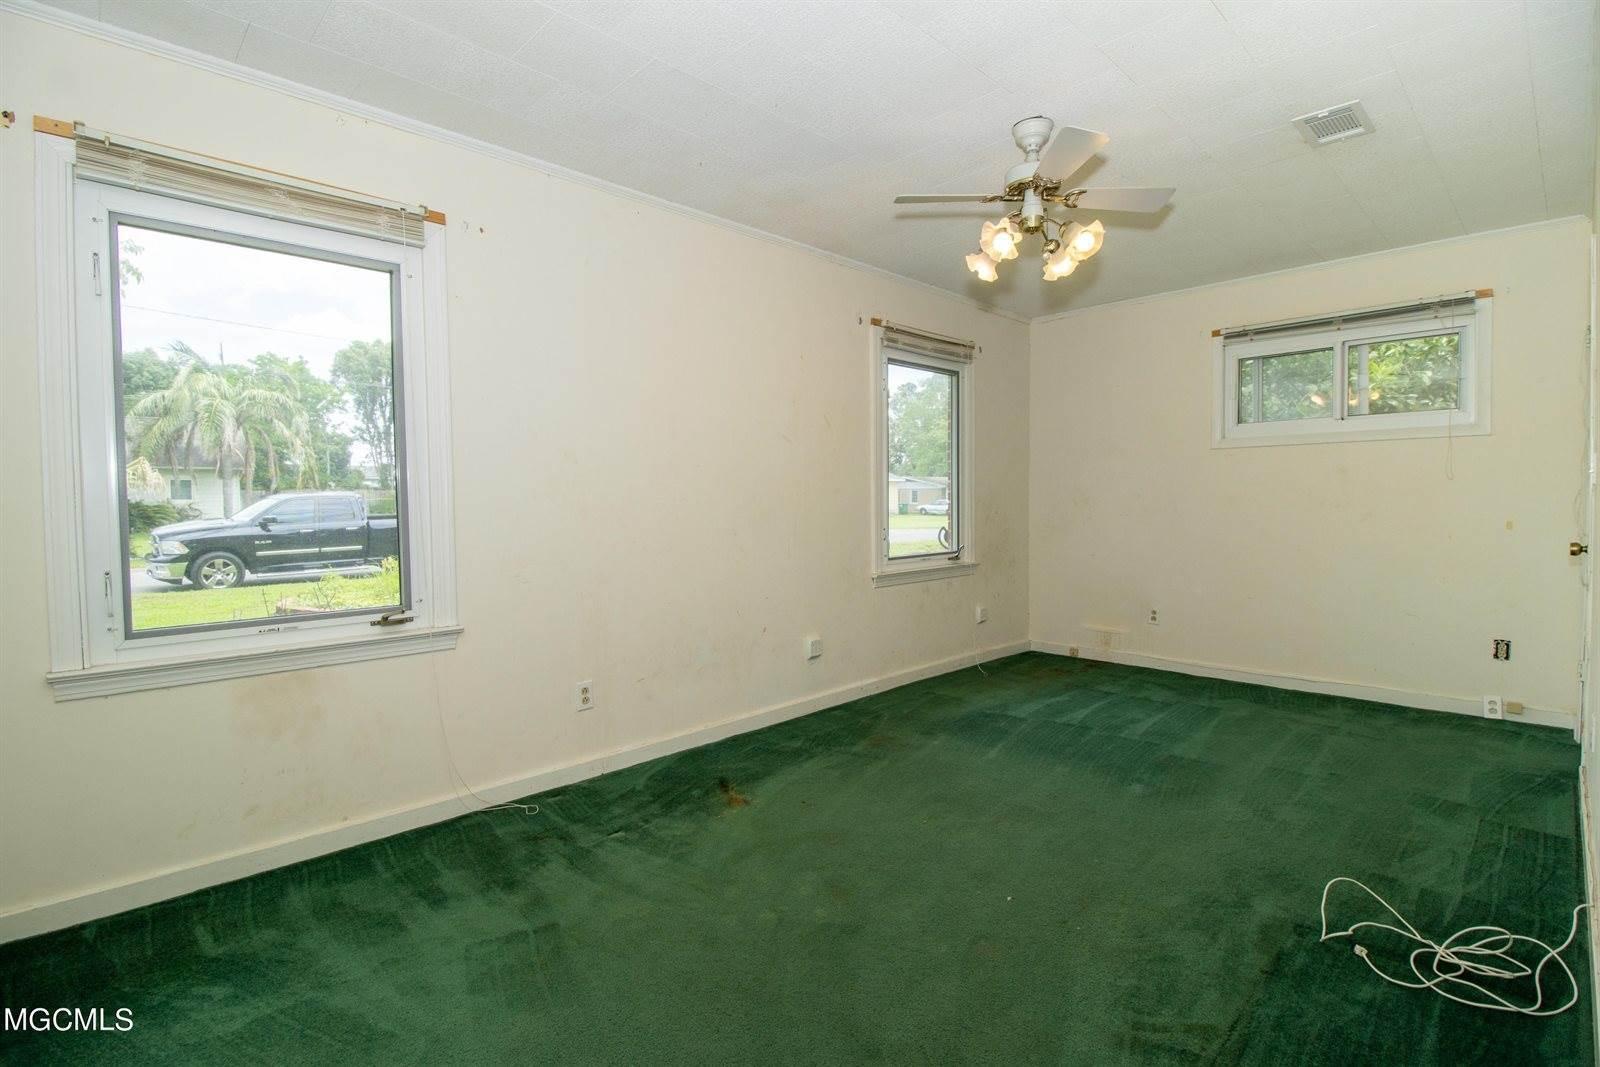 39 East Park St, Gulfport, MS 39507